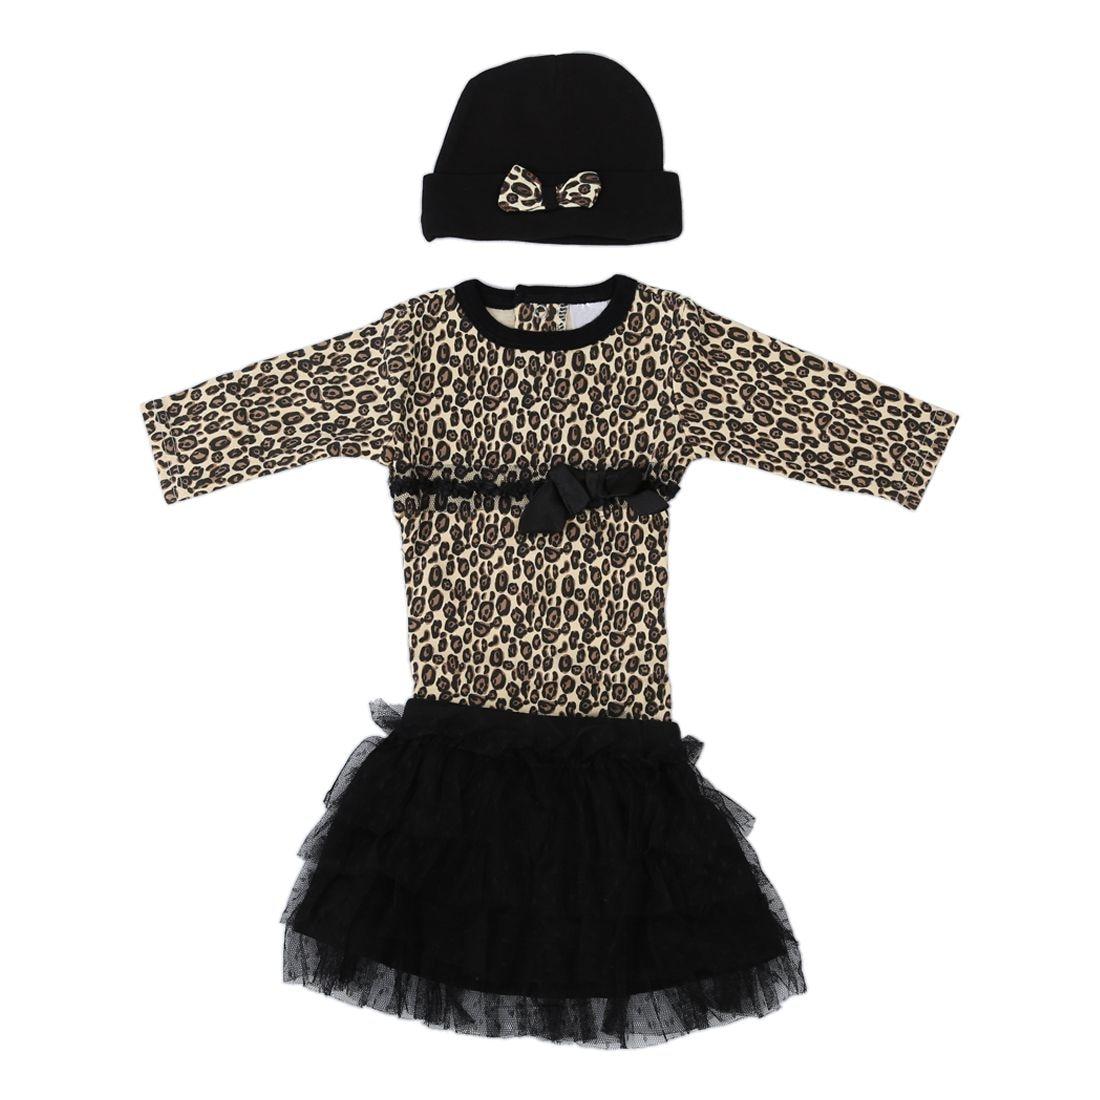 Baby girls 3pcs sets:long sleeved rompers + tutu skirt dress+hat Autumn girls leopard kids clothing sets-9M